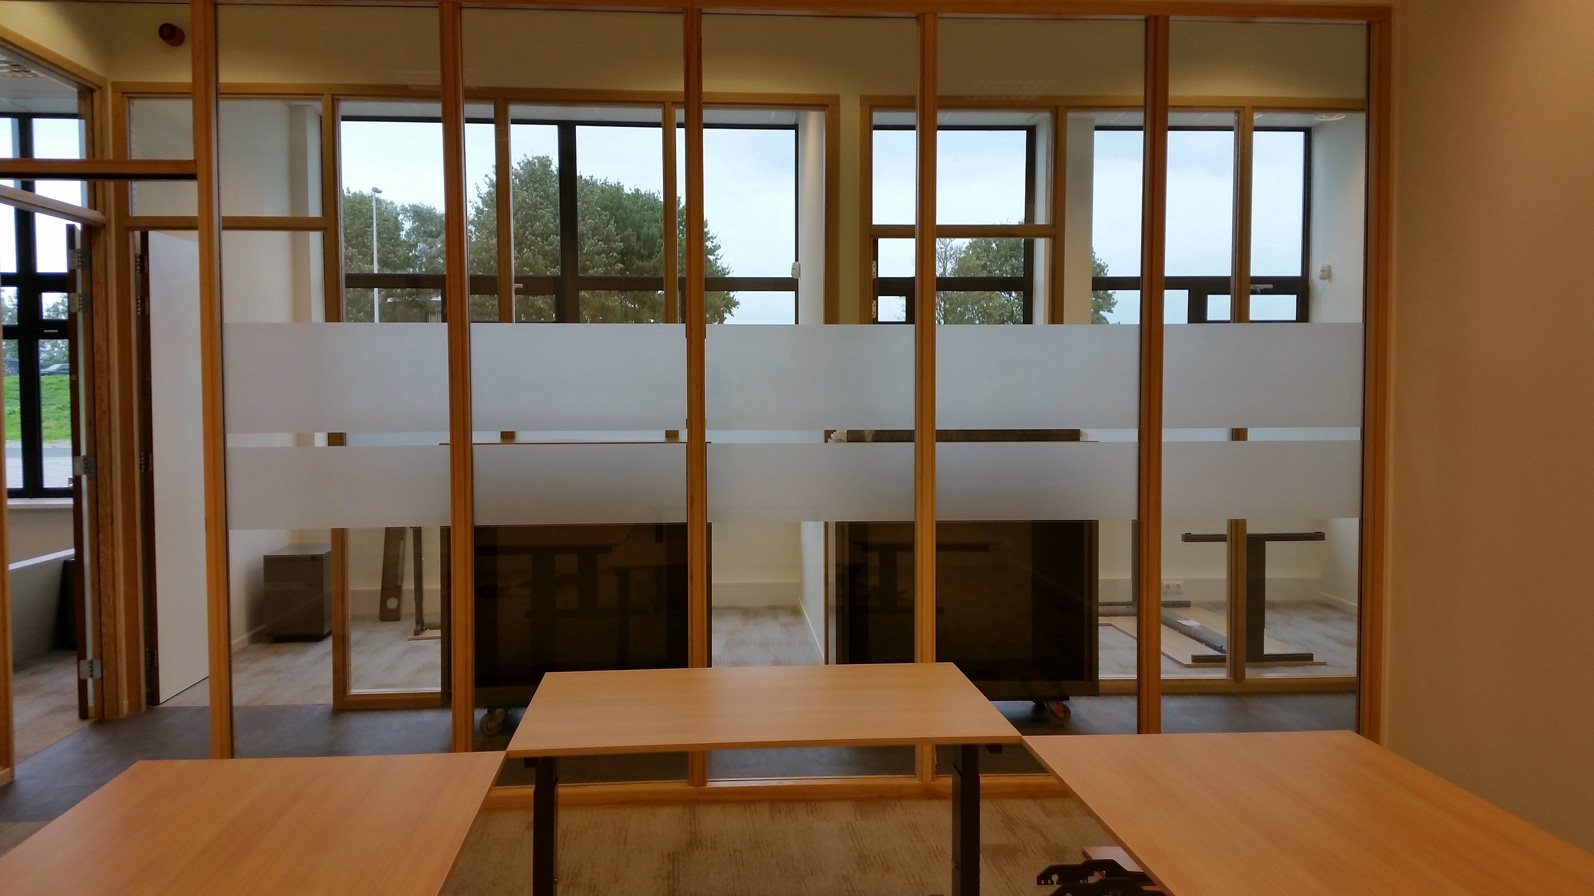 Raamfolie idee n te gebruiken voor eigen raamfolie ontwerp - Photo deco kantoor ...